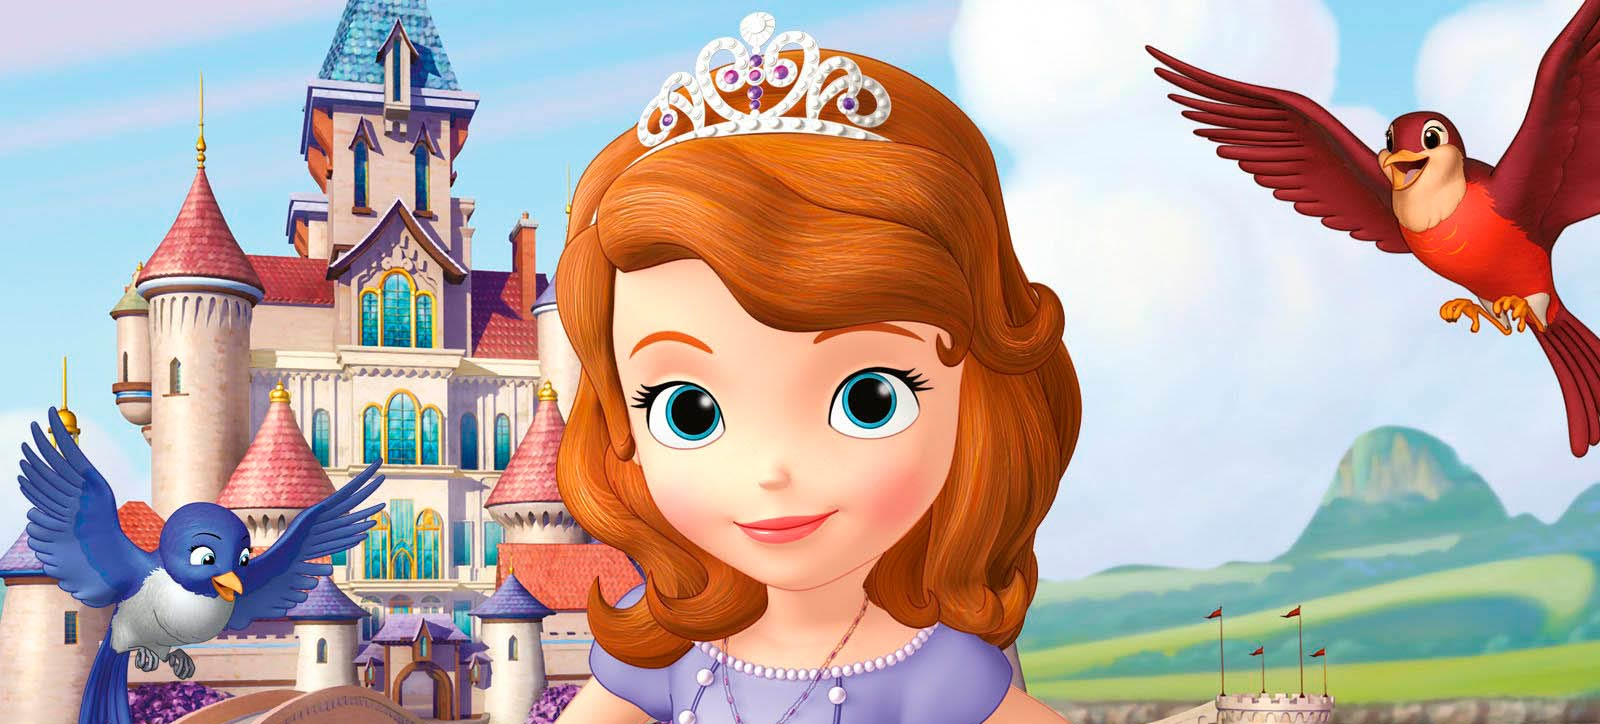 Dibujos De La Princesa Sofia Para Colorear: Princesa Sofia Dibujos Colorear